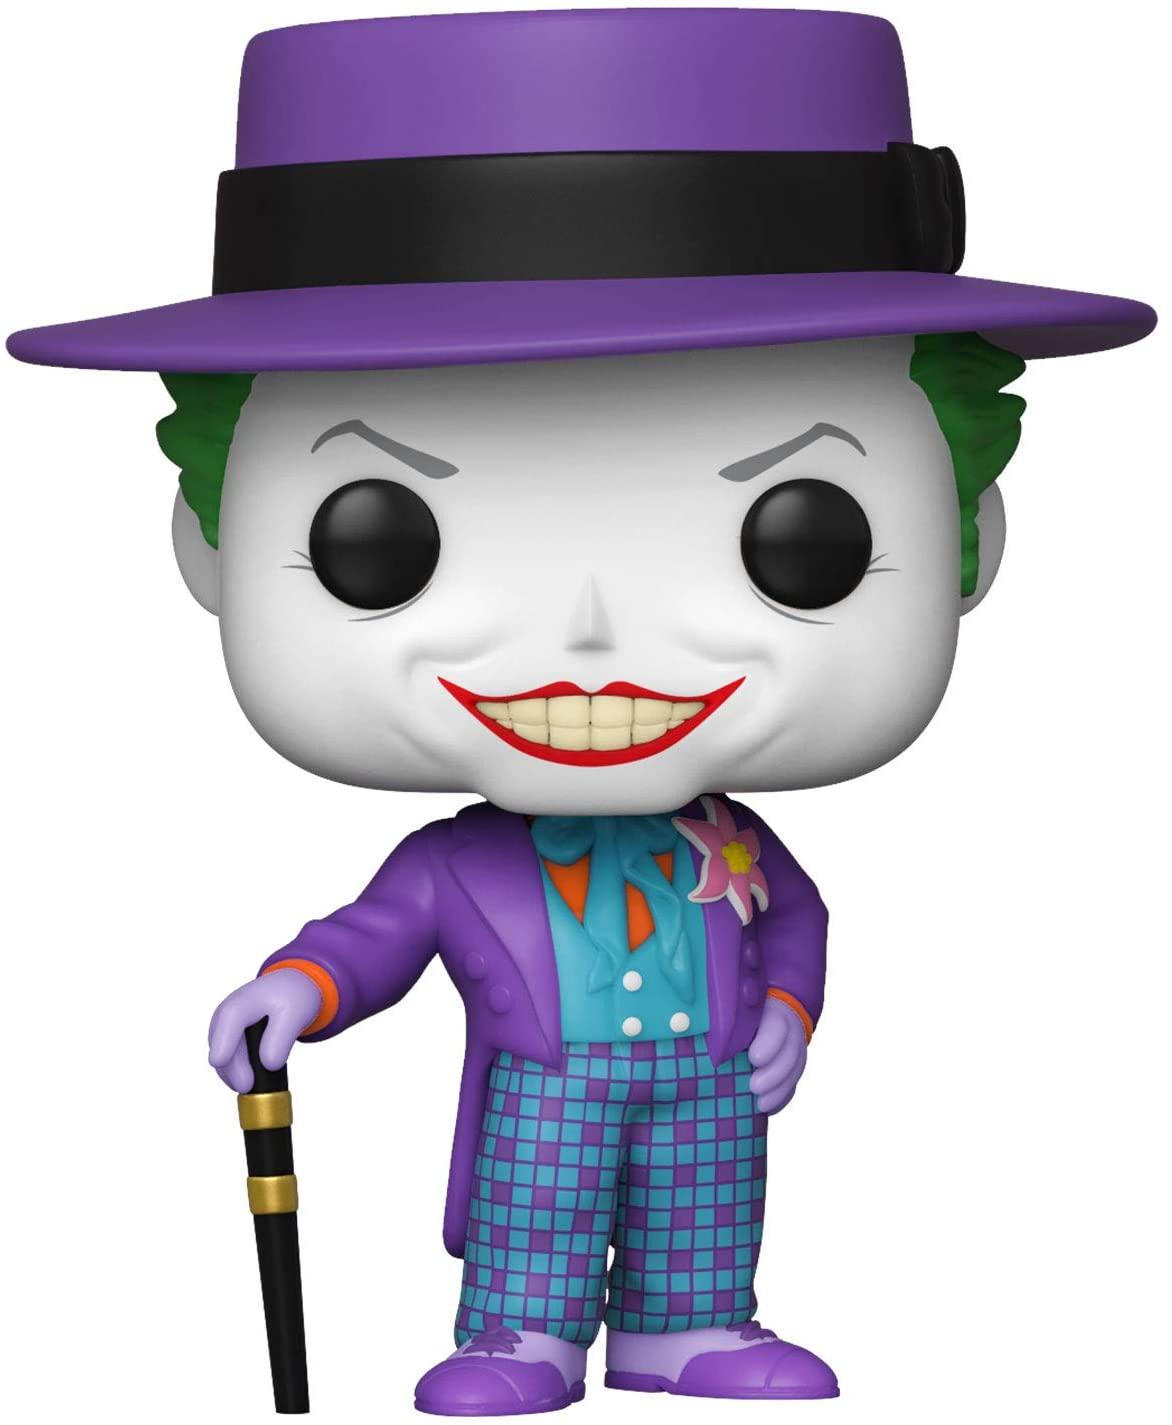 Funko Pop! Heroes: Batman 1989 - The Joker Vinyl Figure